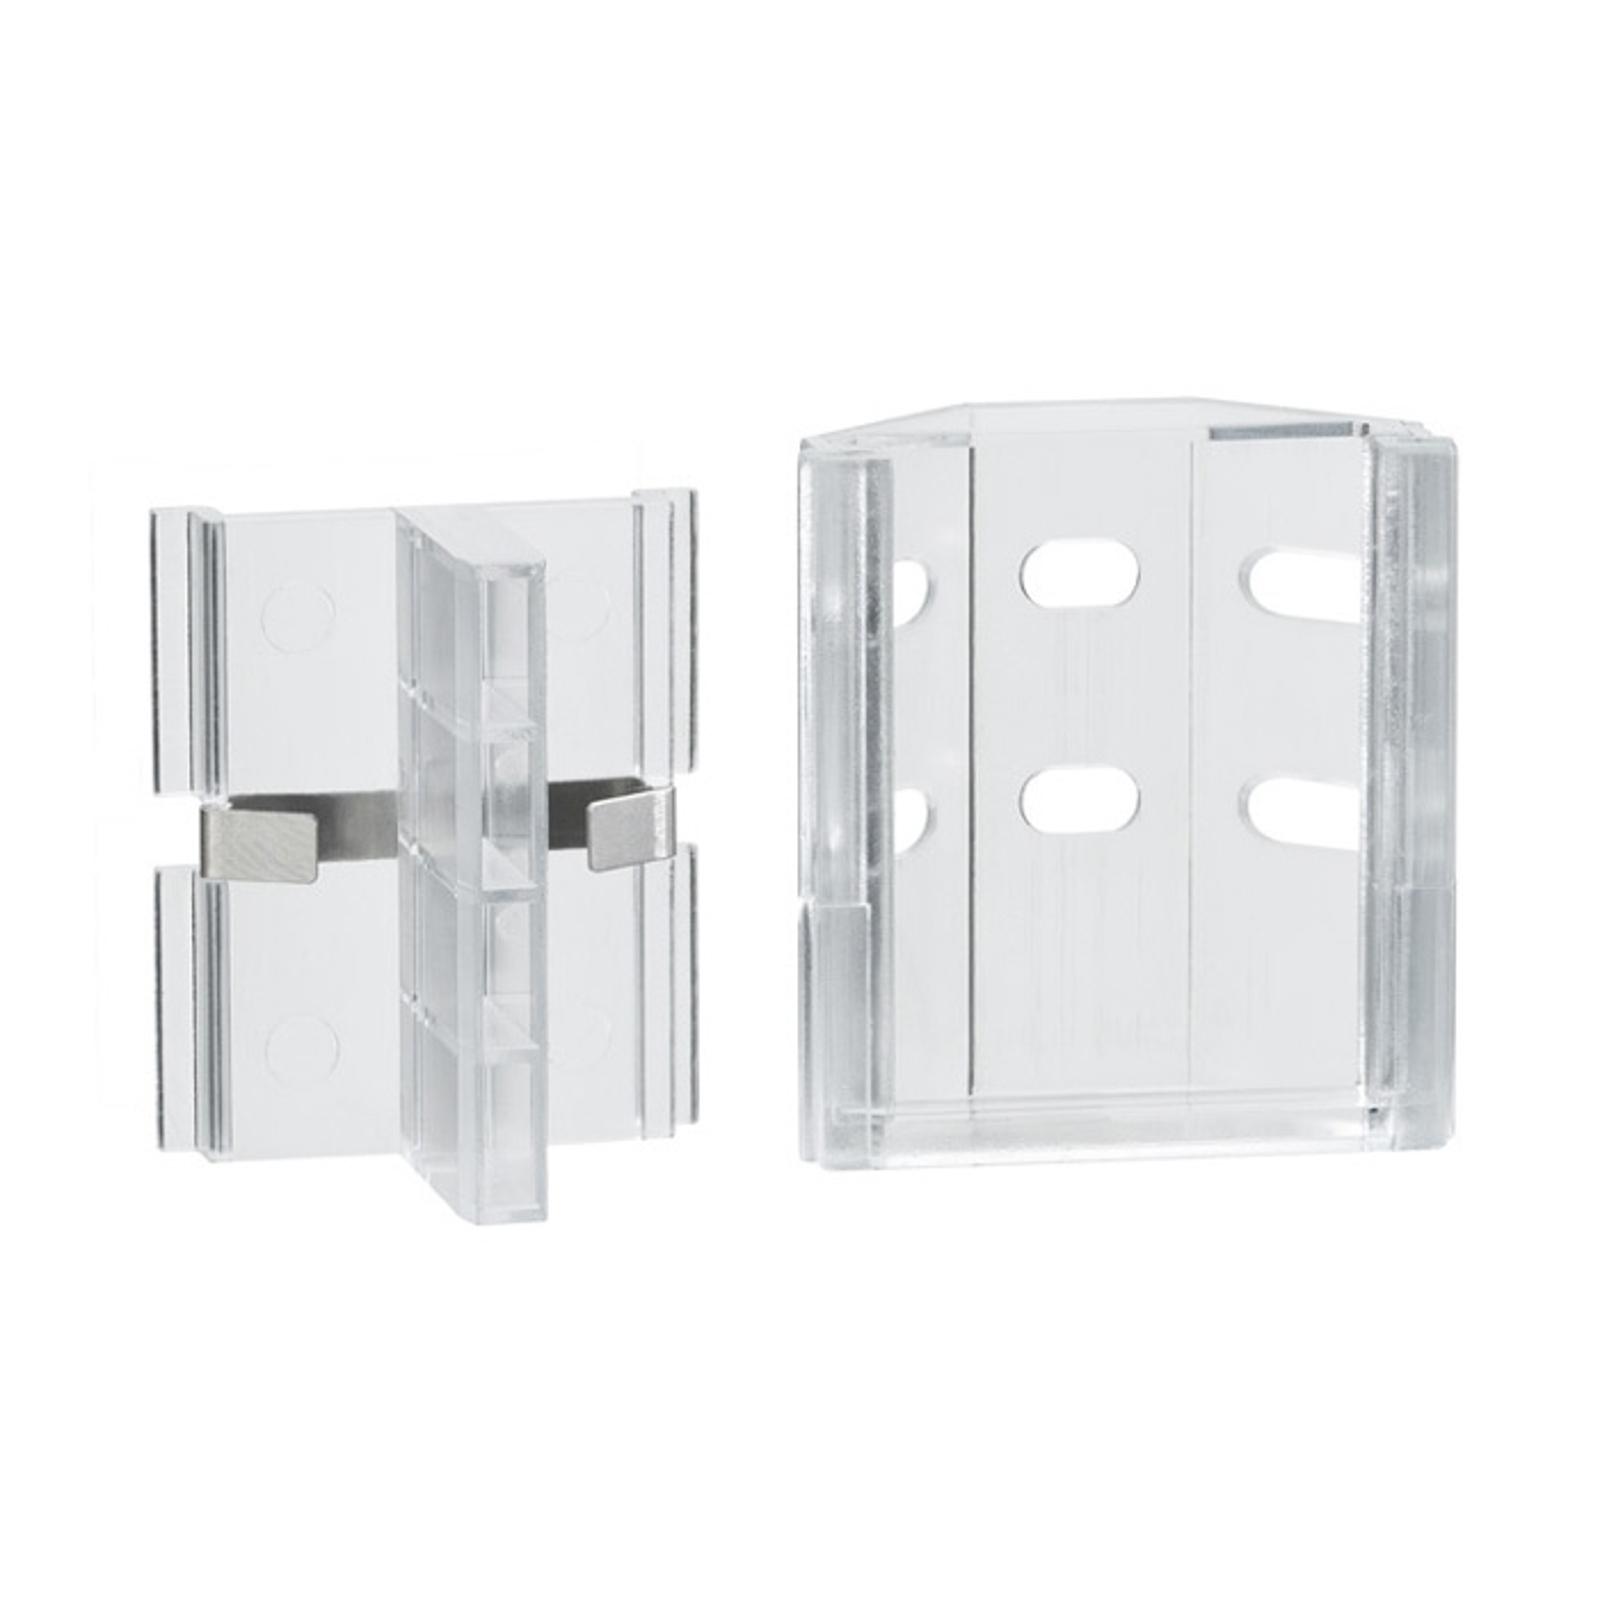 Paulmann Duo Profil Eckhalter für LED-Stripes, 2er